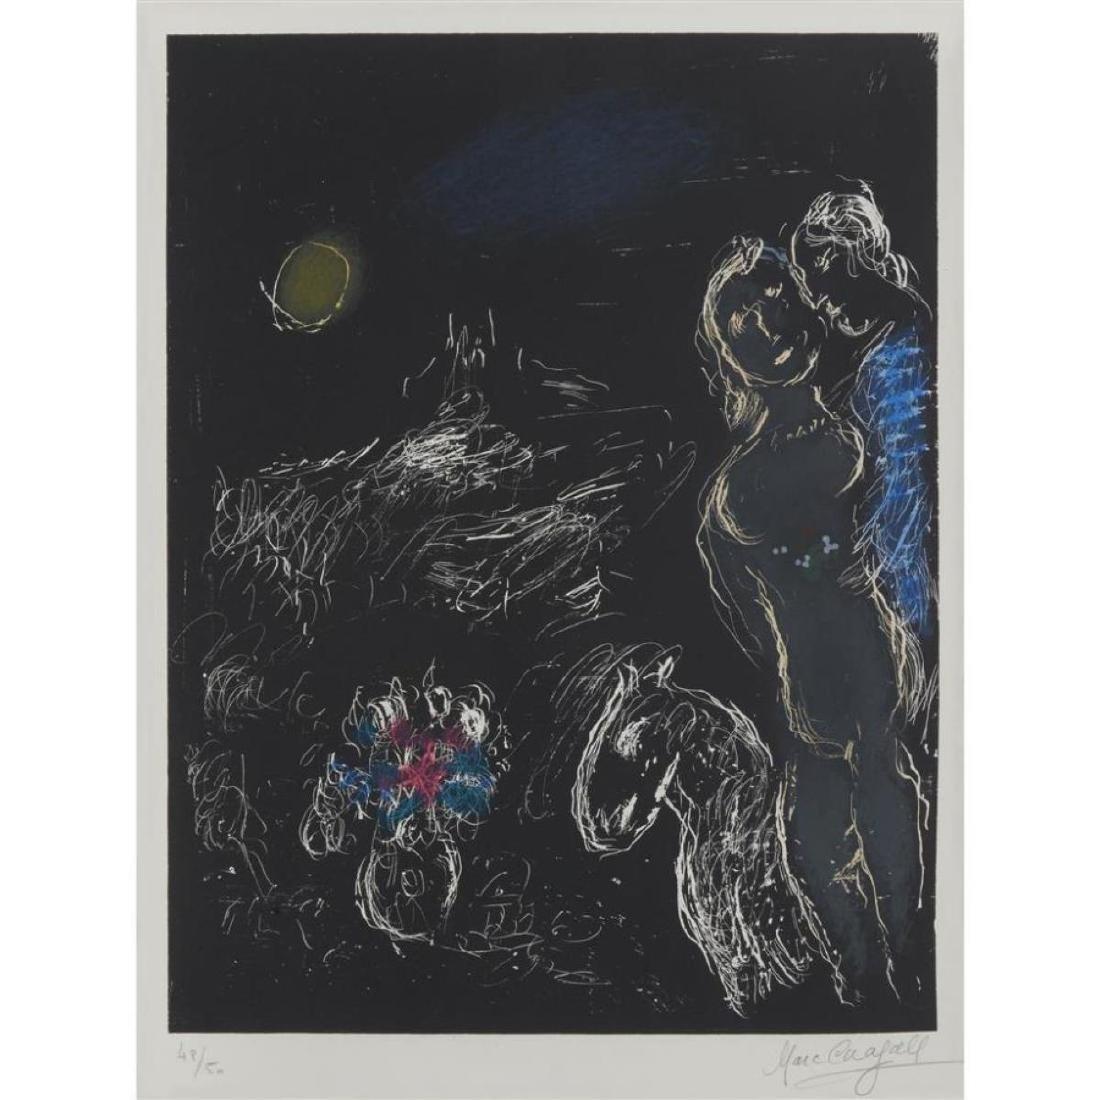 Marc Chagall - Saint-Paul at Night